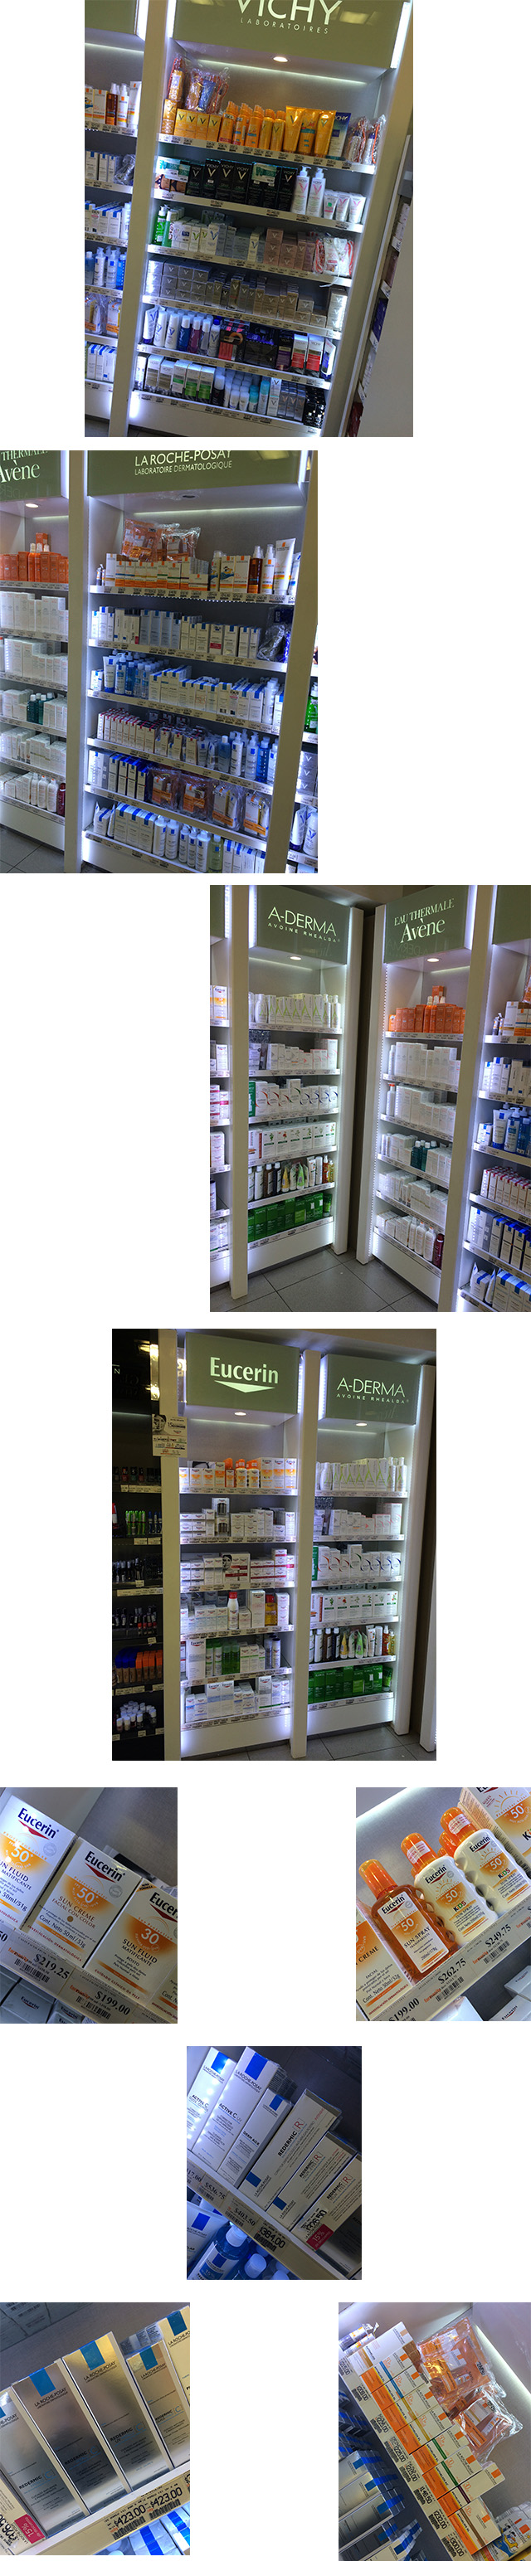 farmacia BUE